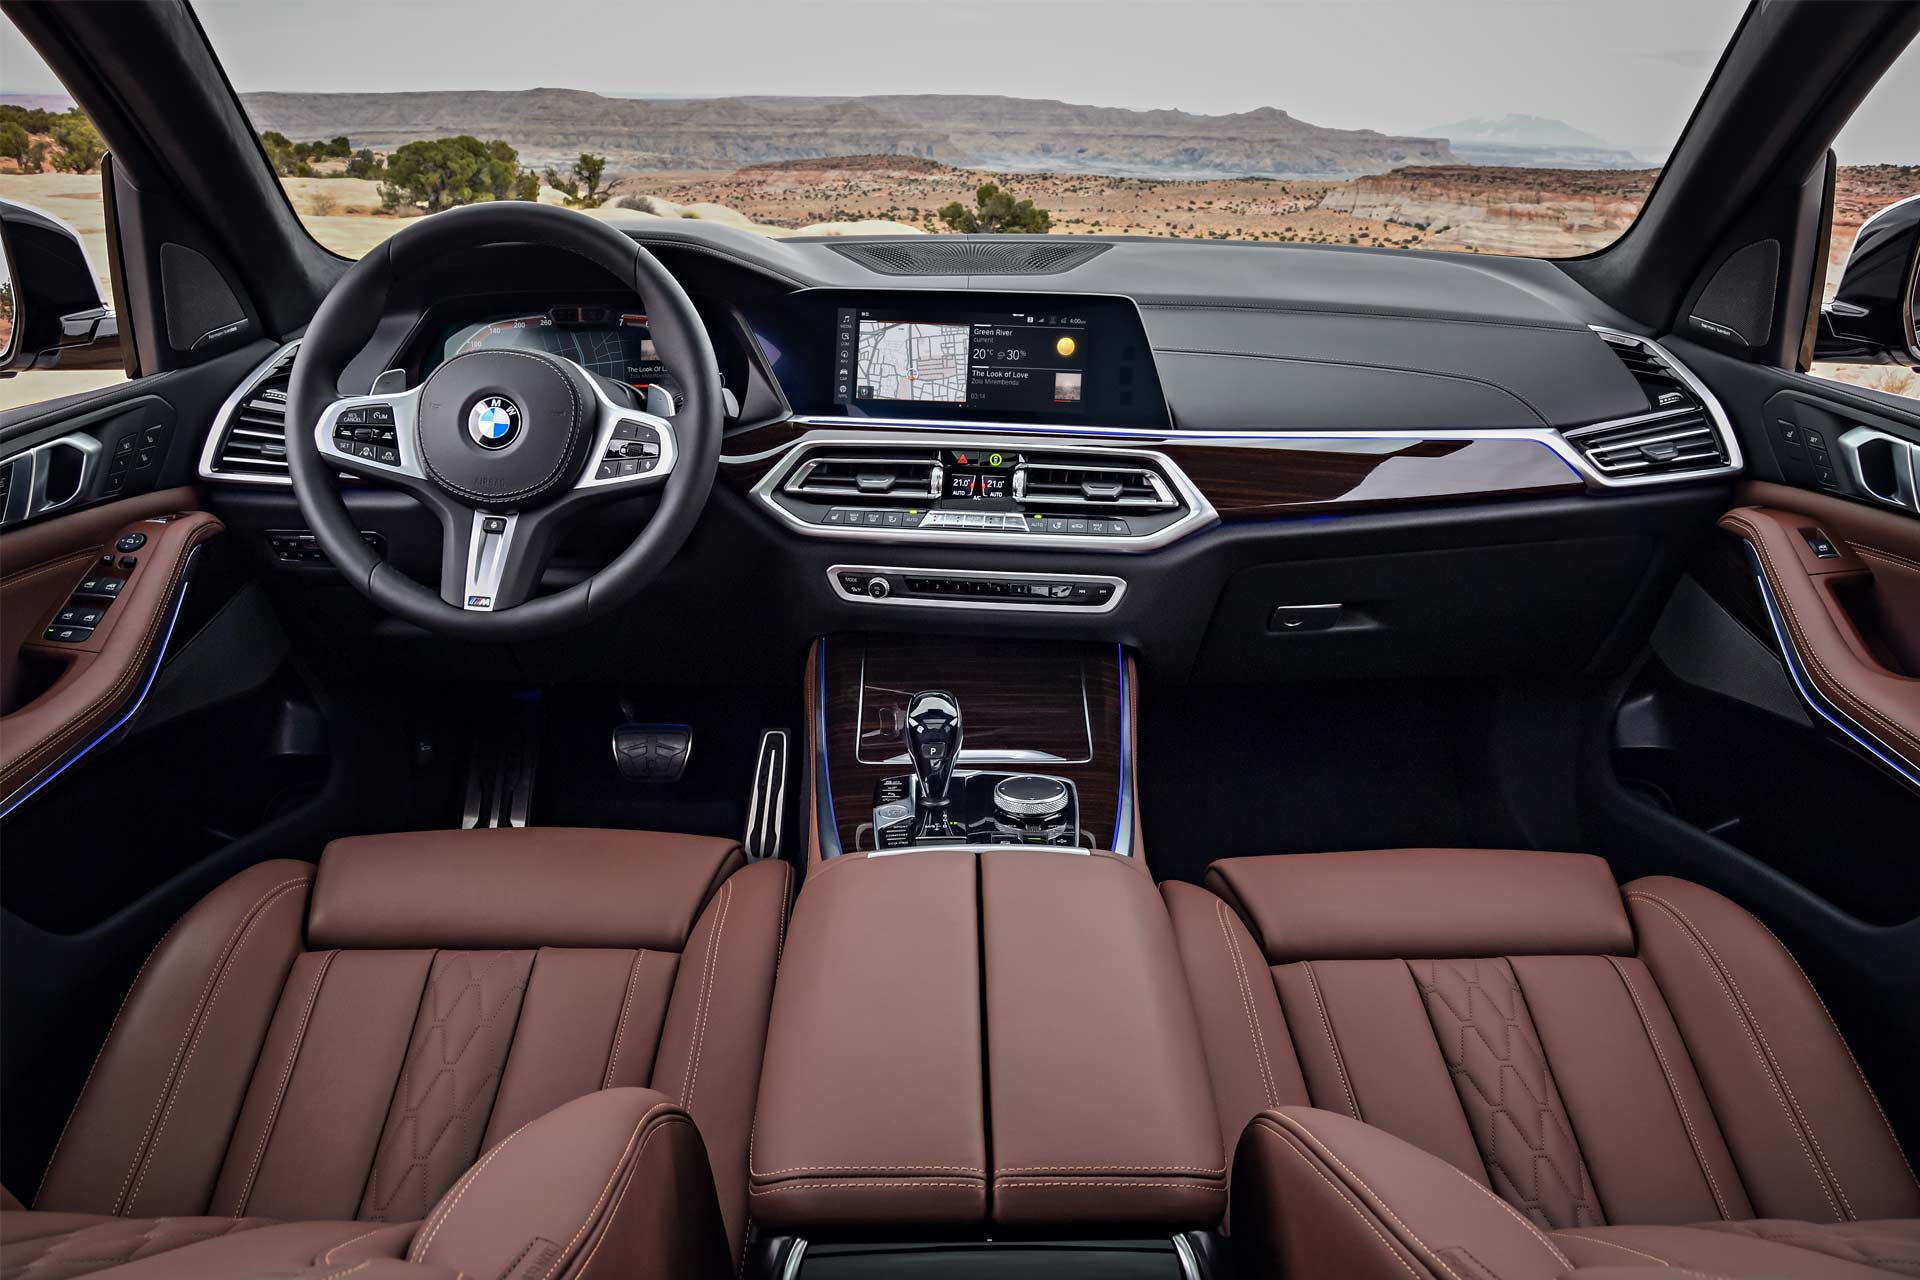 2019-BMW-X5-interior